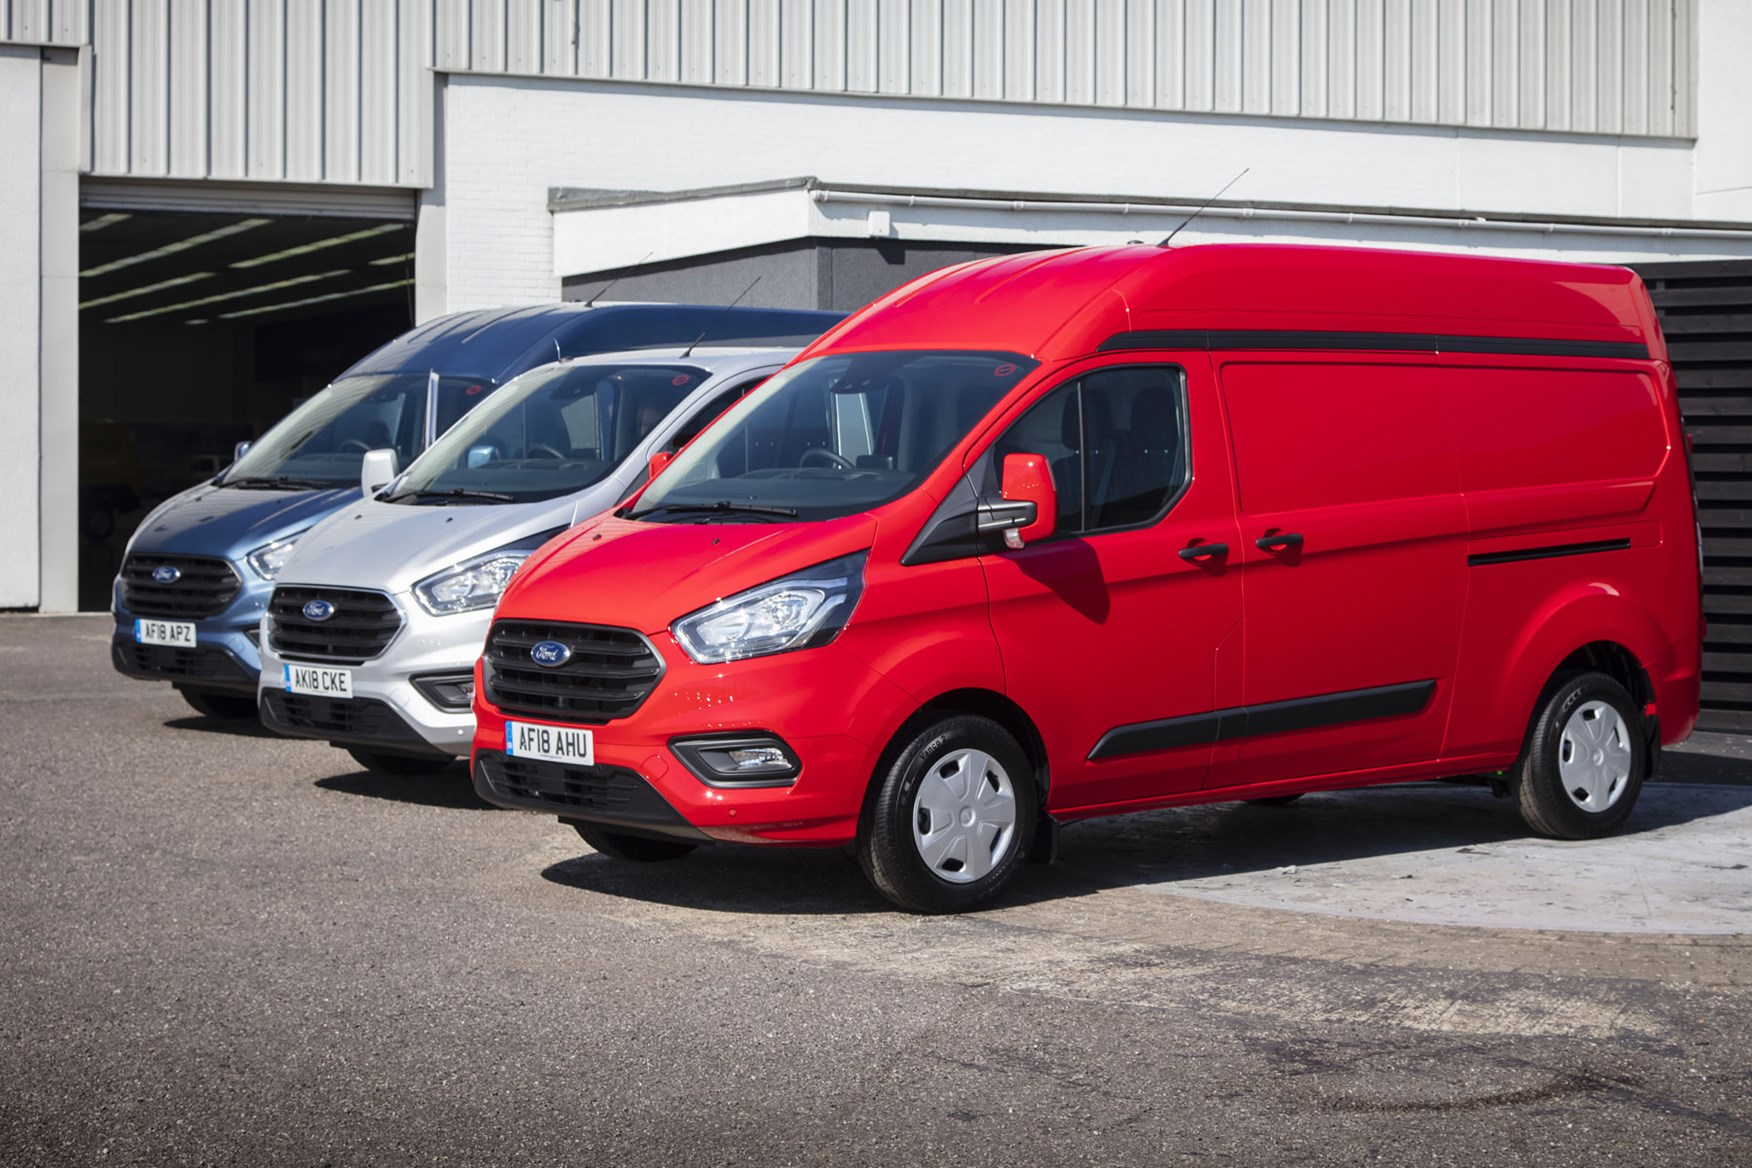 Ford Transit Custom van dimensions, capacity, payload, volume